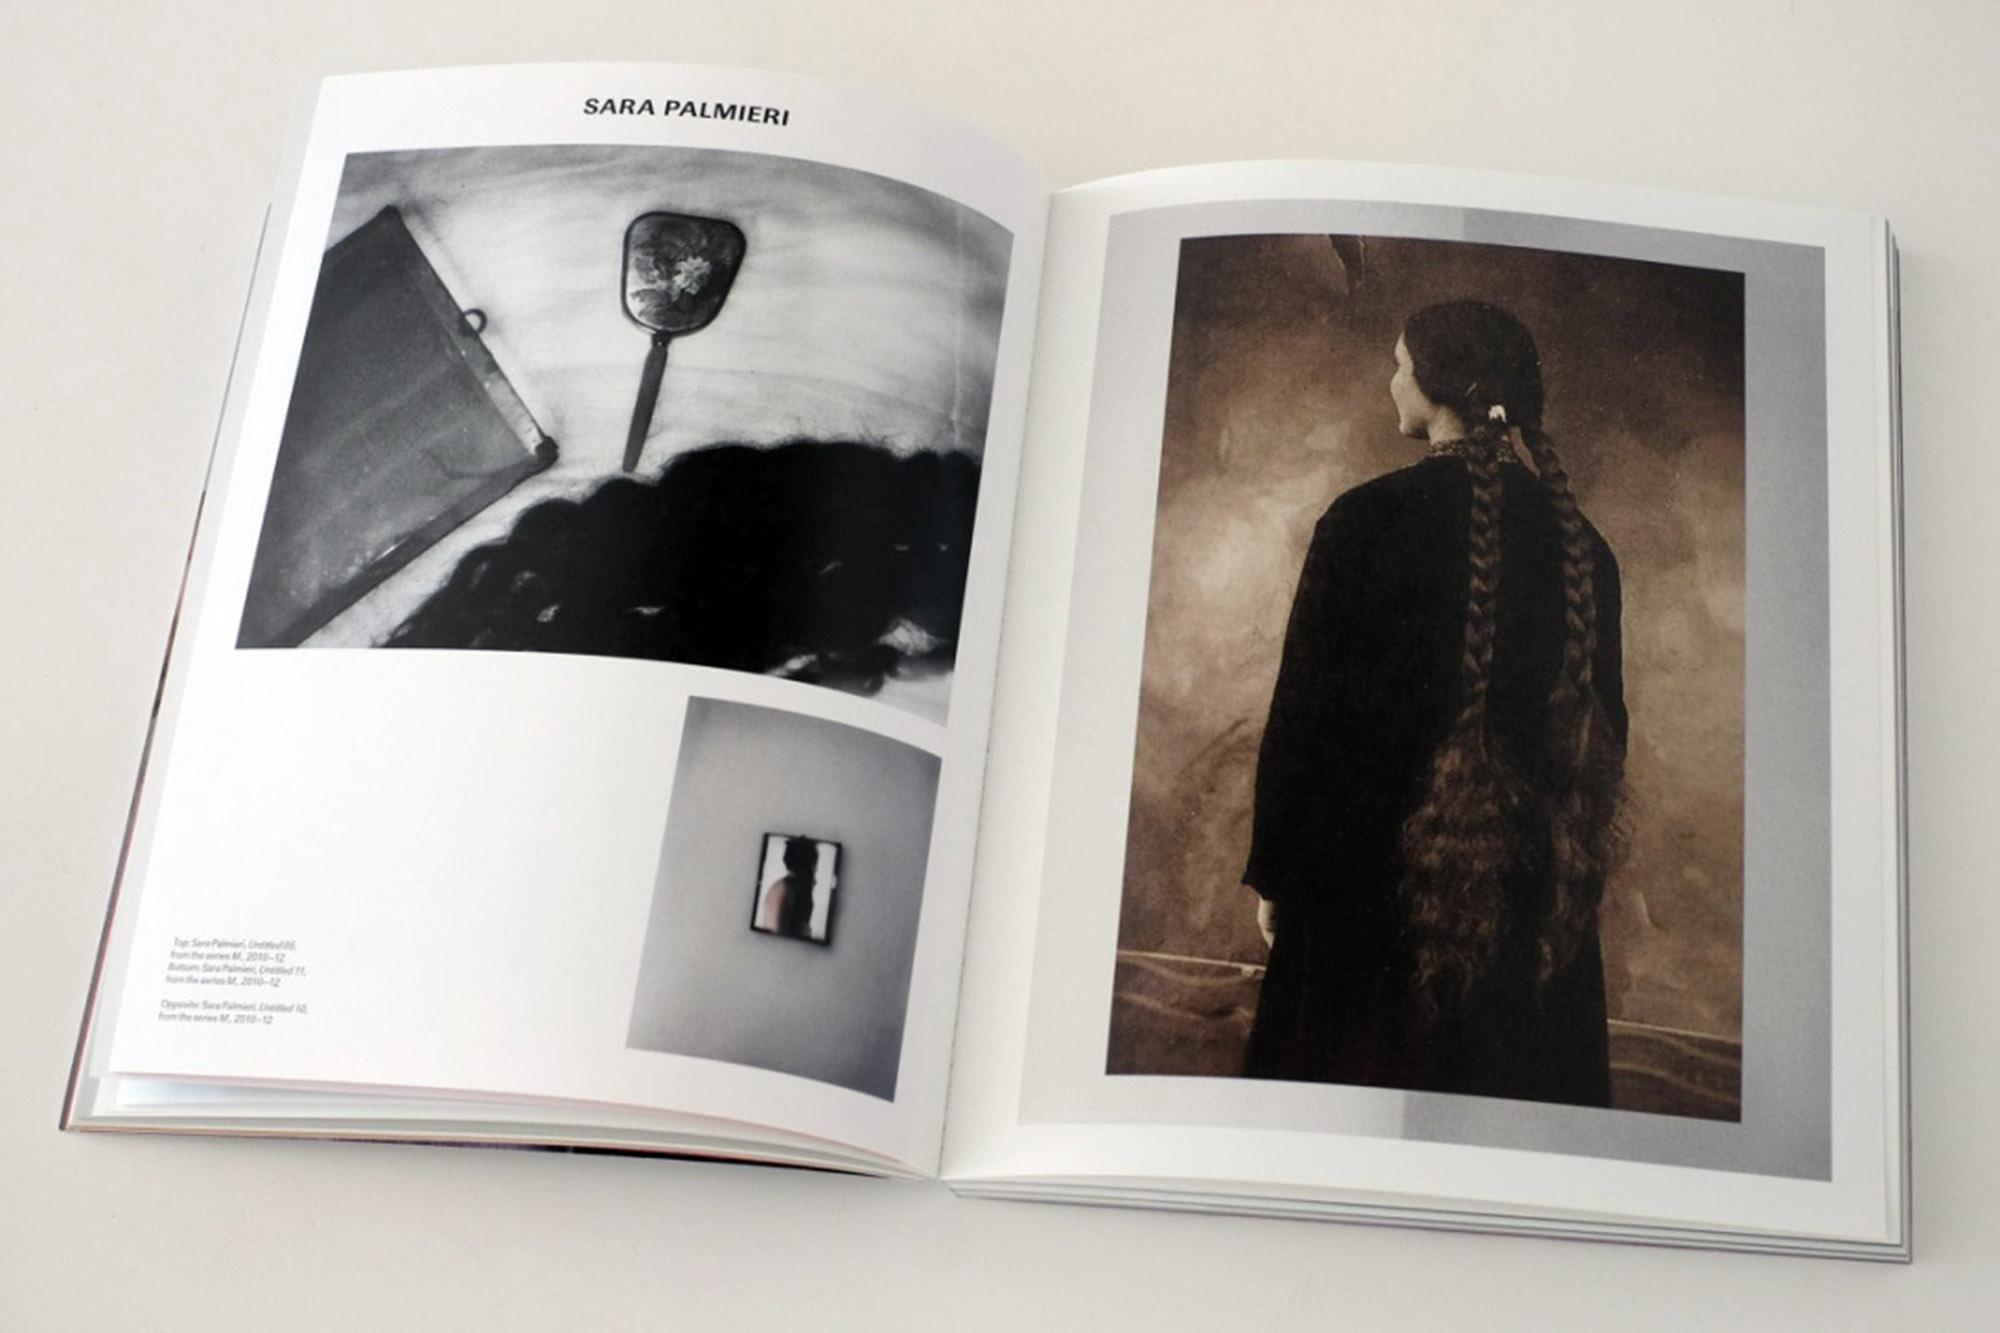 M._Photoworks Annual Issue 22_publication04.jpg